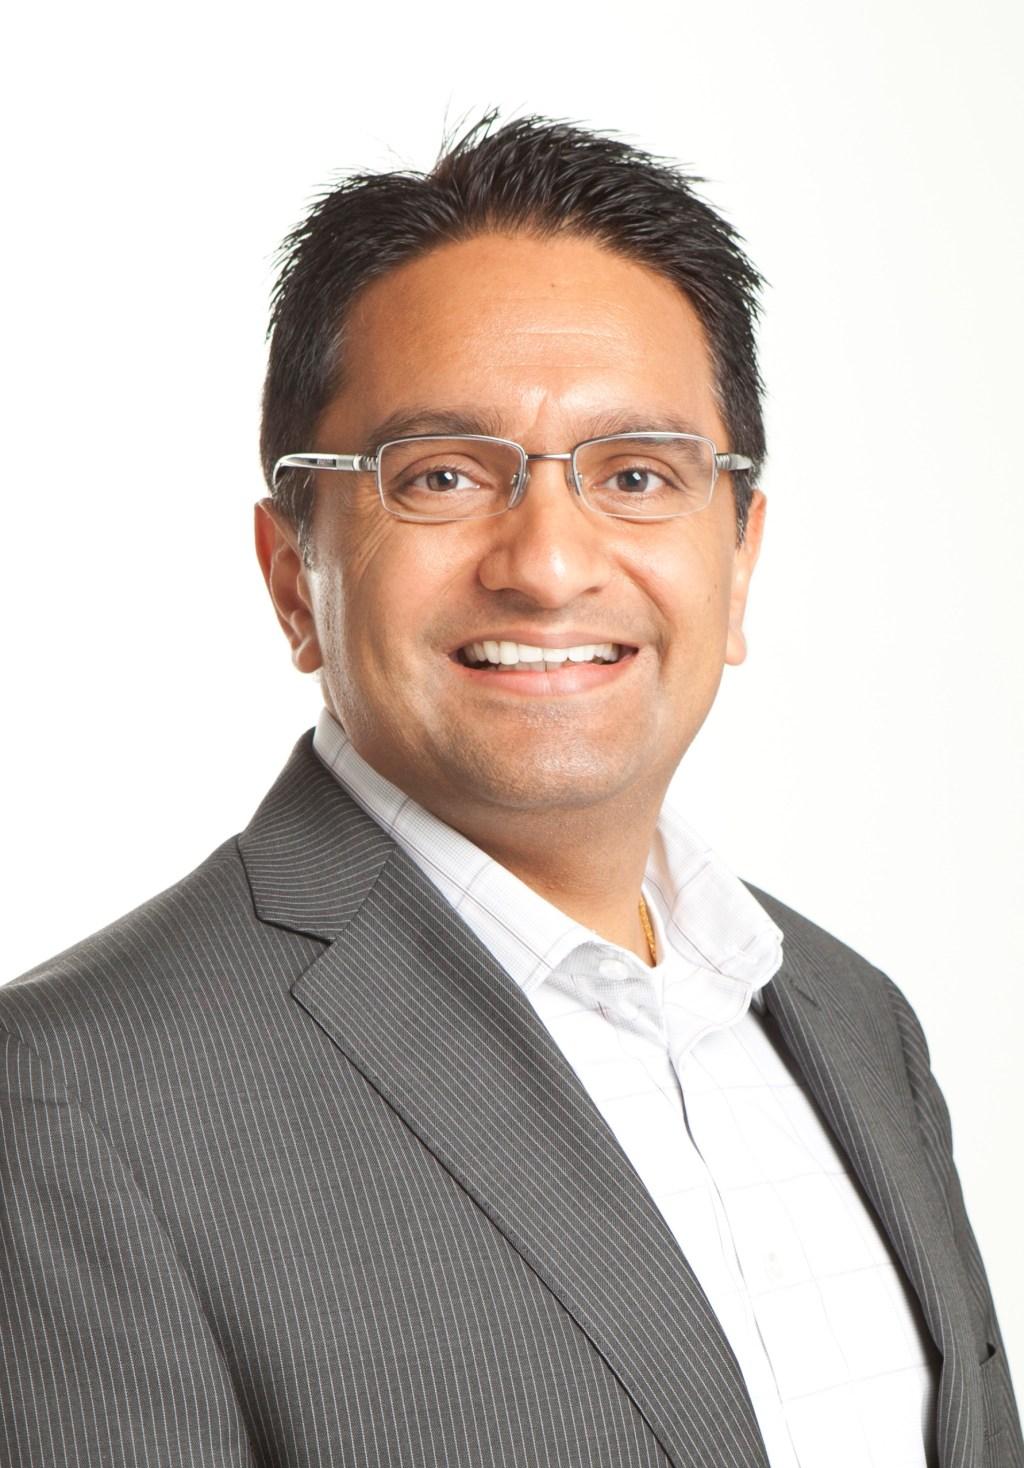 Sunny Jain of Unilever